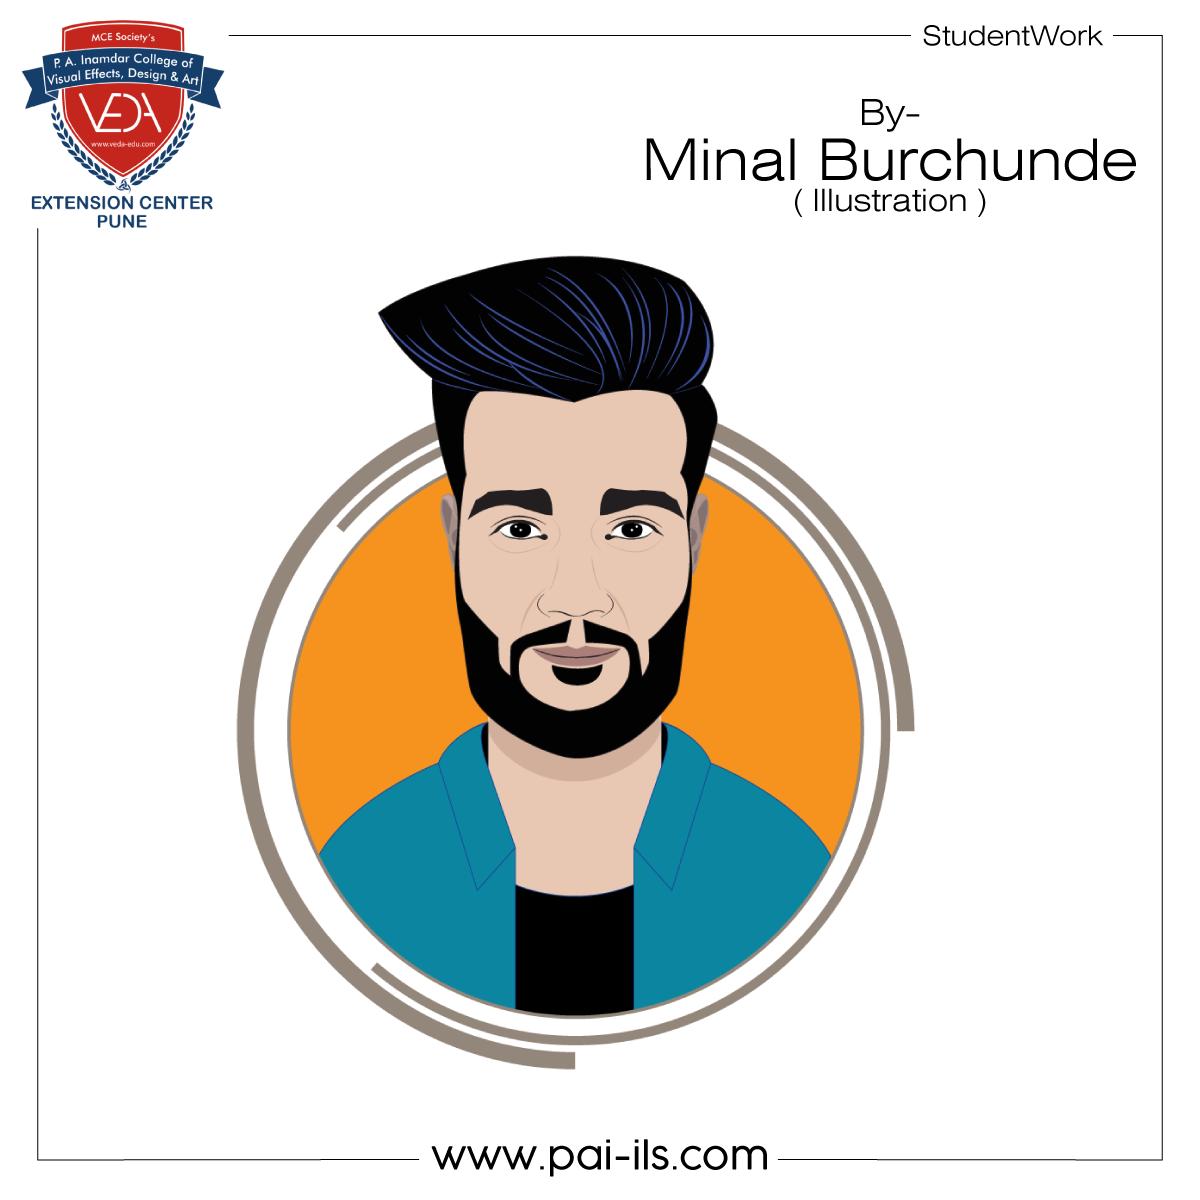 Minal-Burchunde-(-Illustration-)